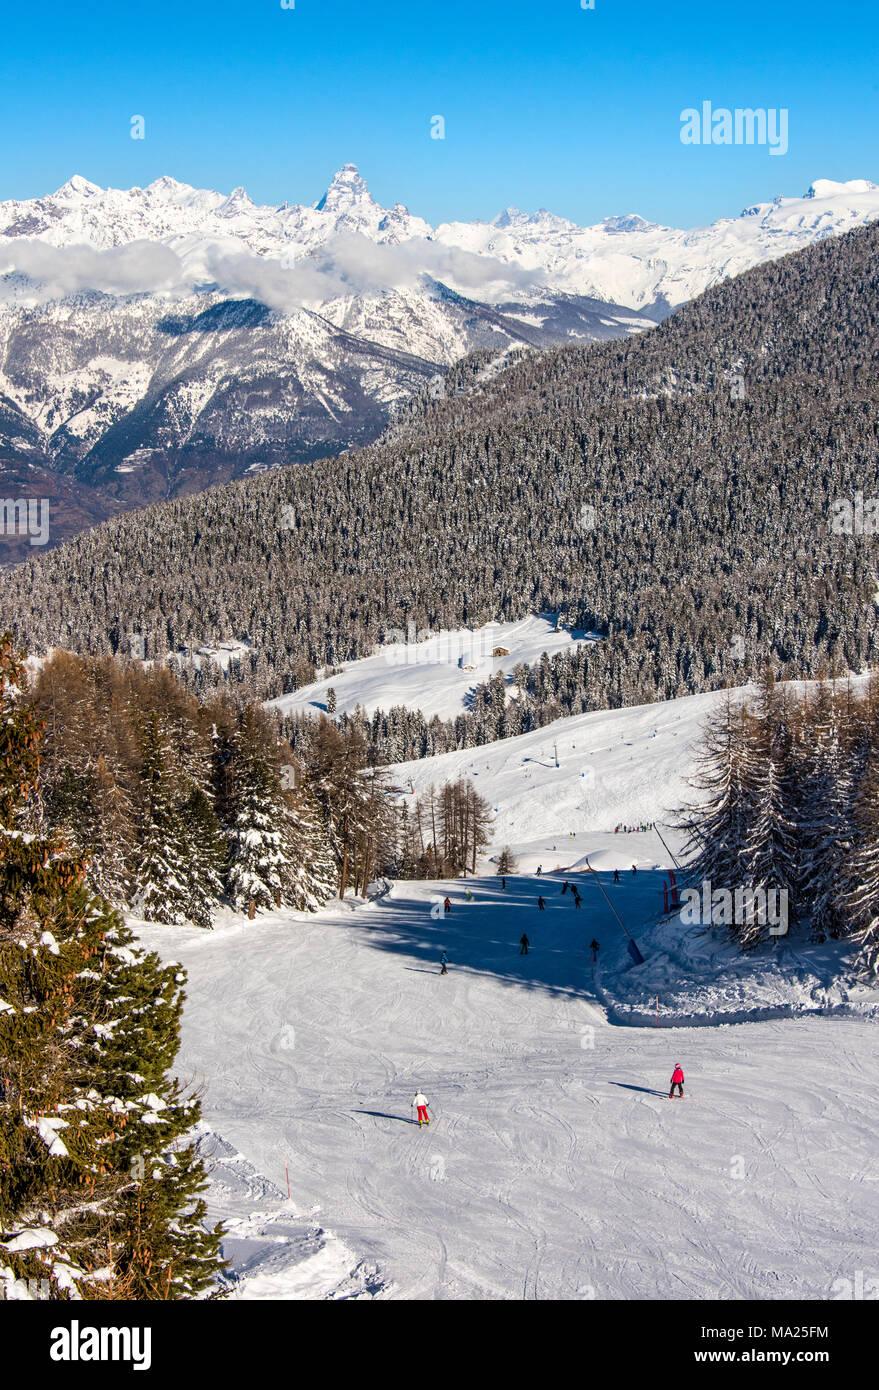 Pila ski resort, Aosta Valley, Italy - Stock Image